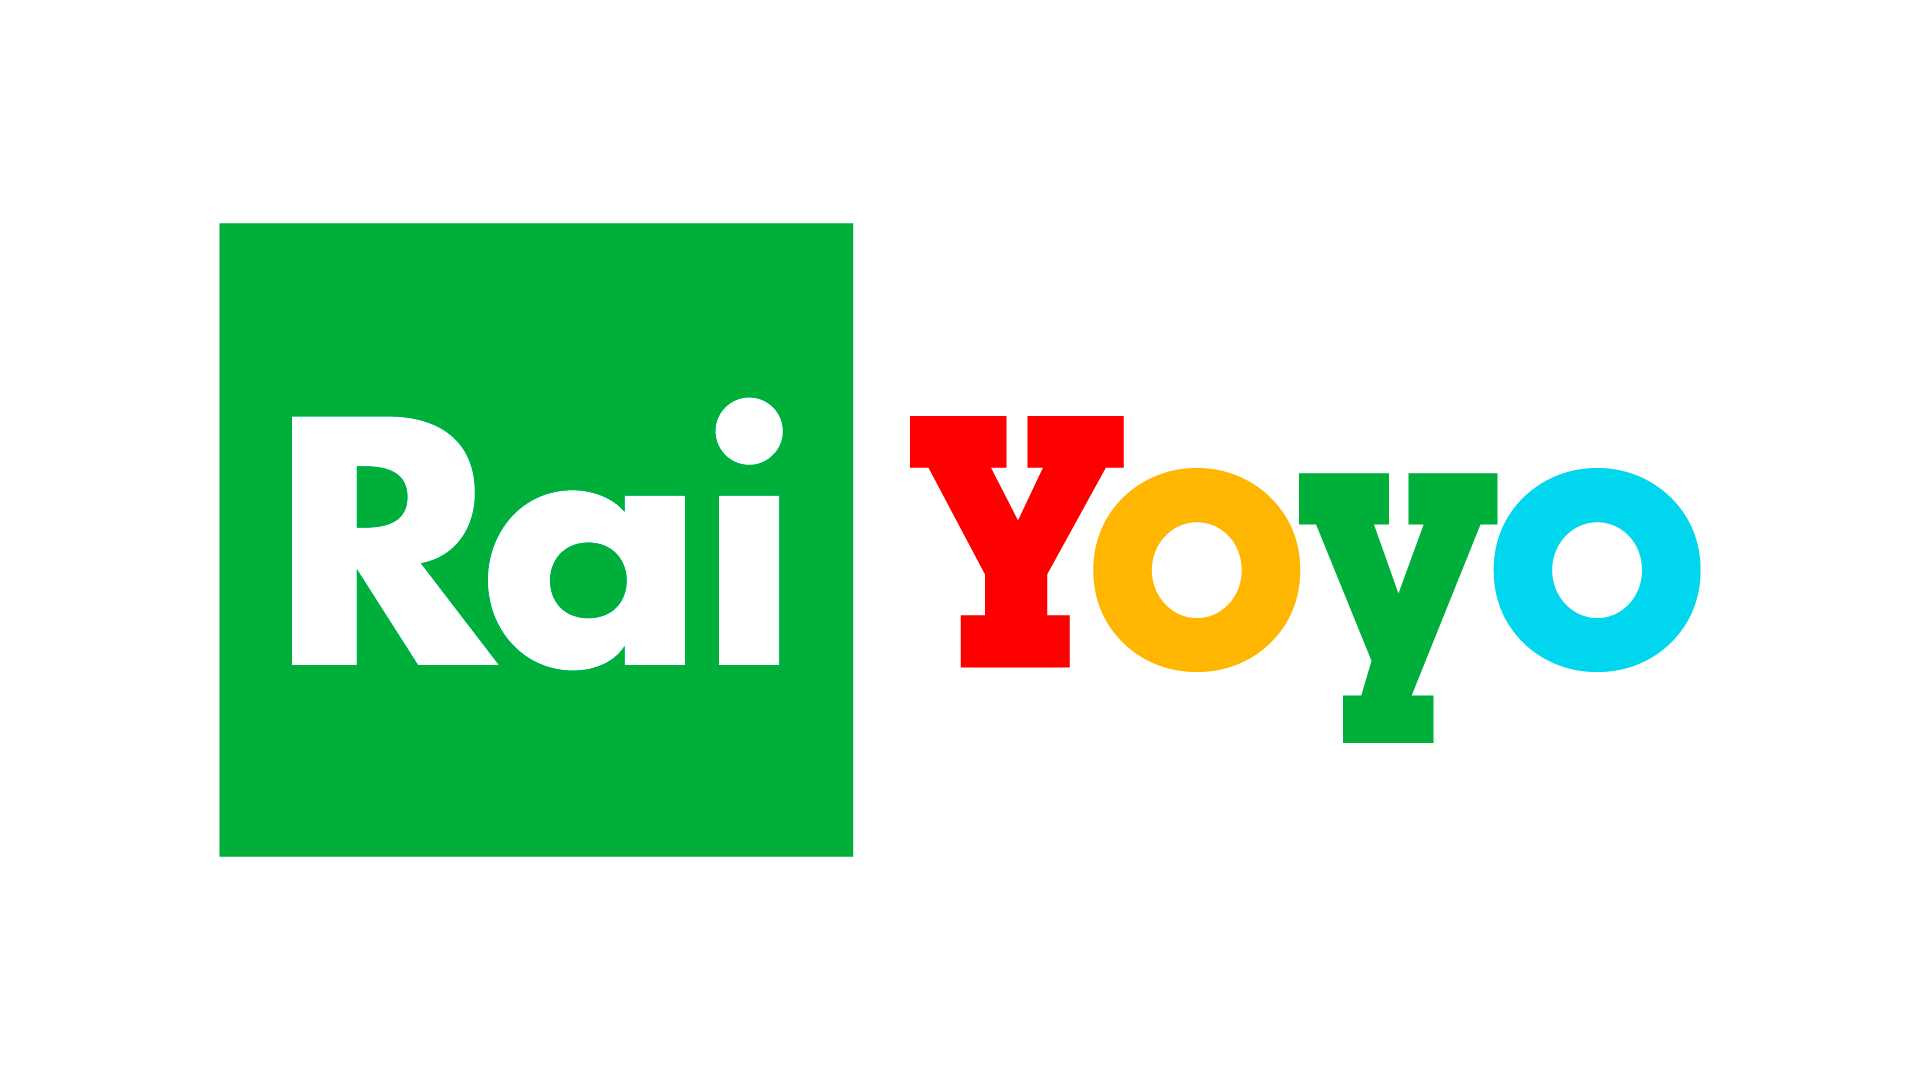 RAI Yoyo in diretta, live